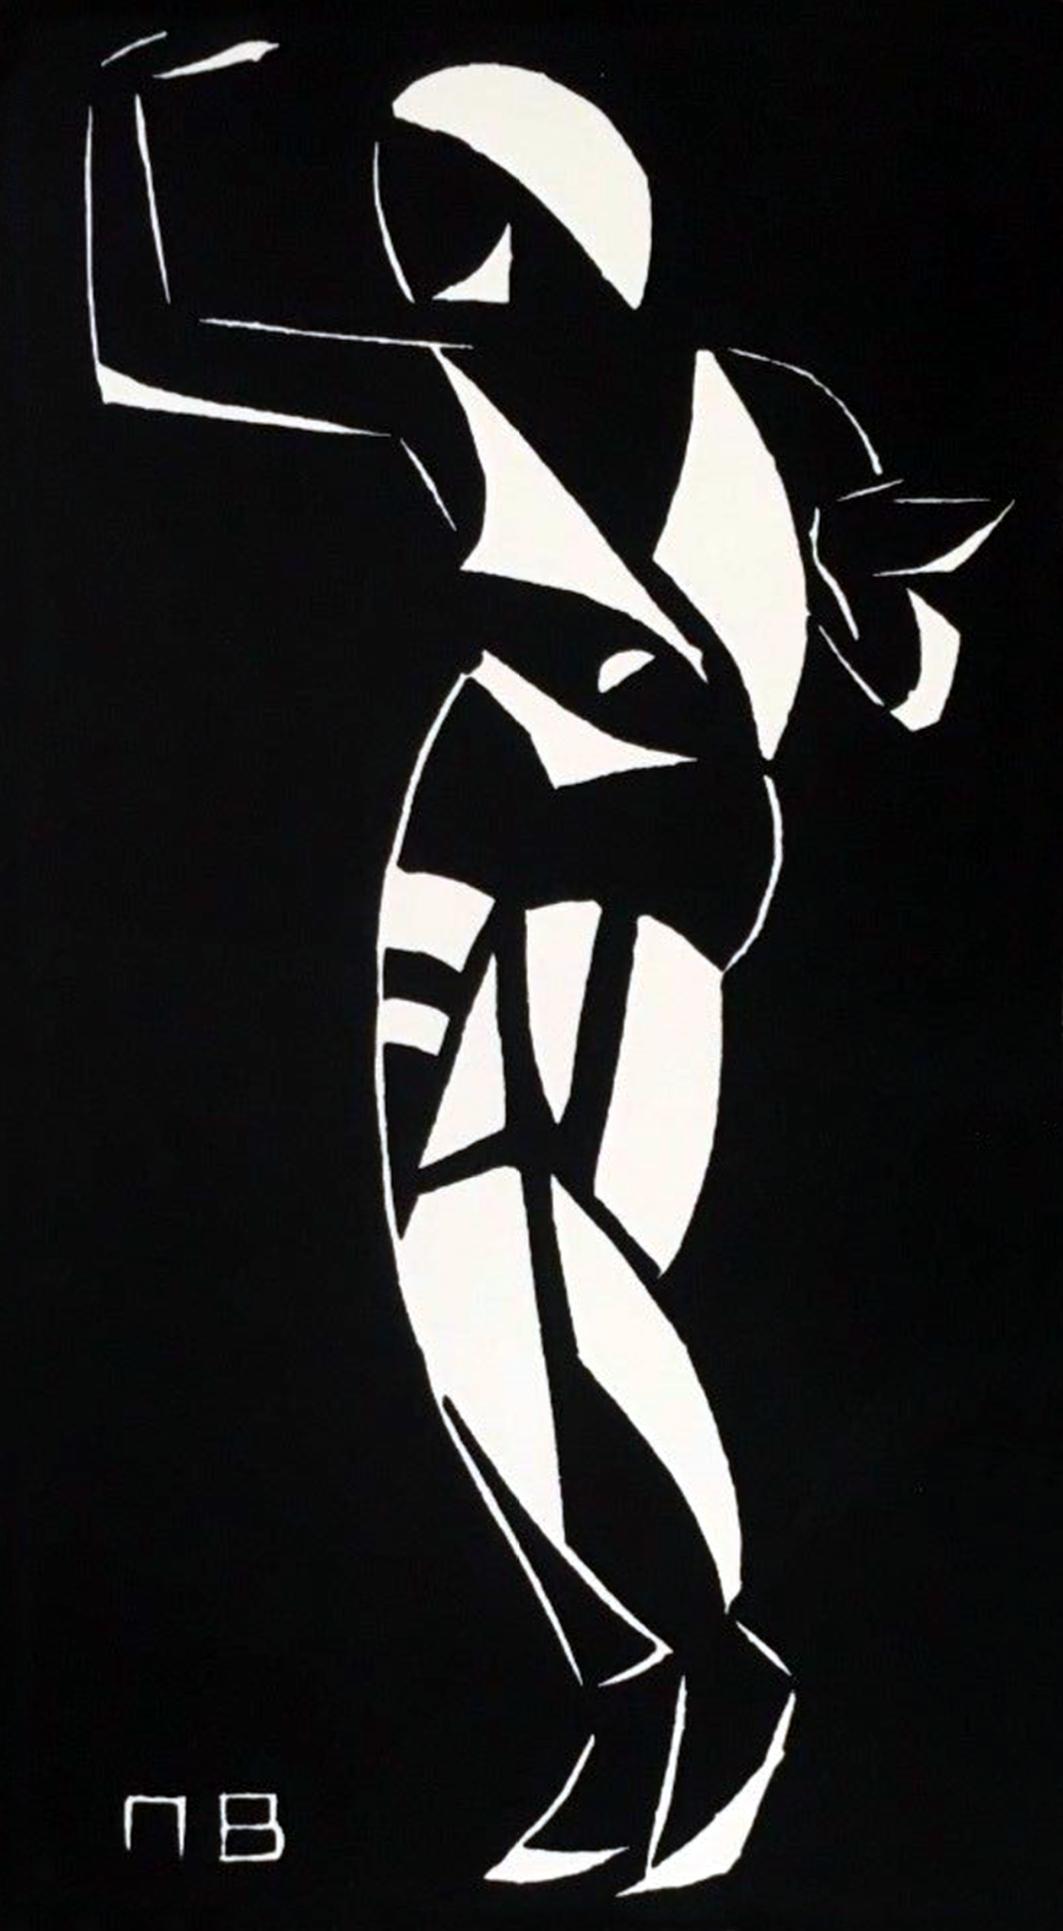 Marcel-Louis Baugniet «Akarovadansant », 1924, kaloprosopie